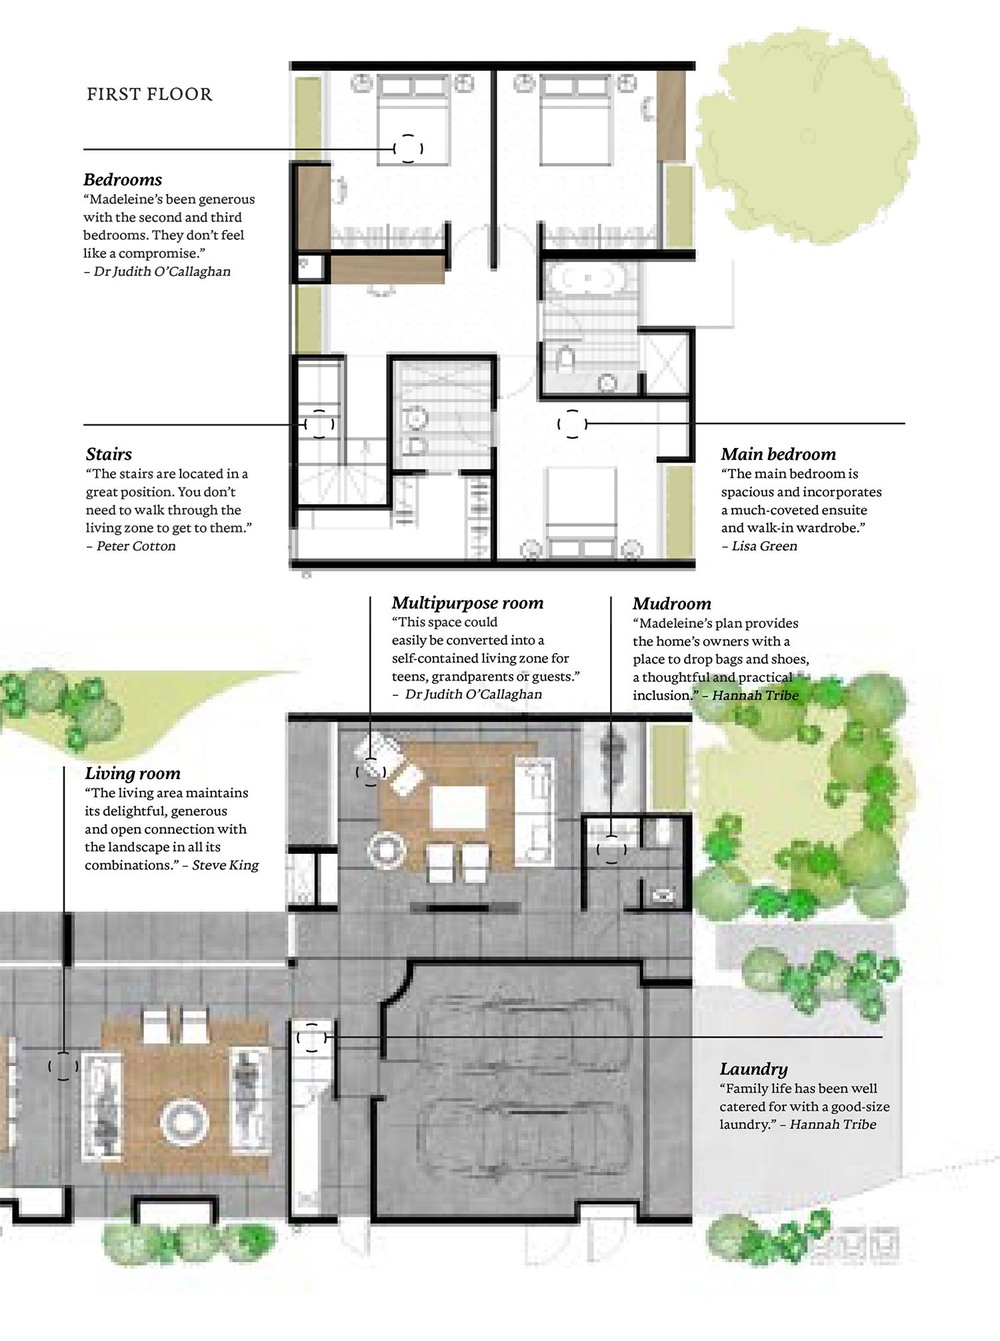 2016 My ideal houseJULY-3.jpg